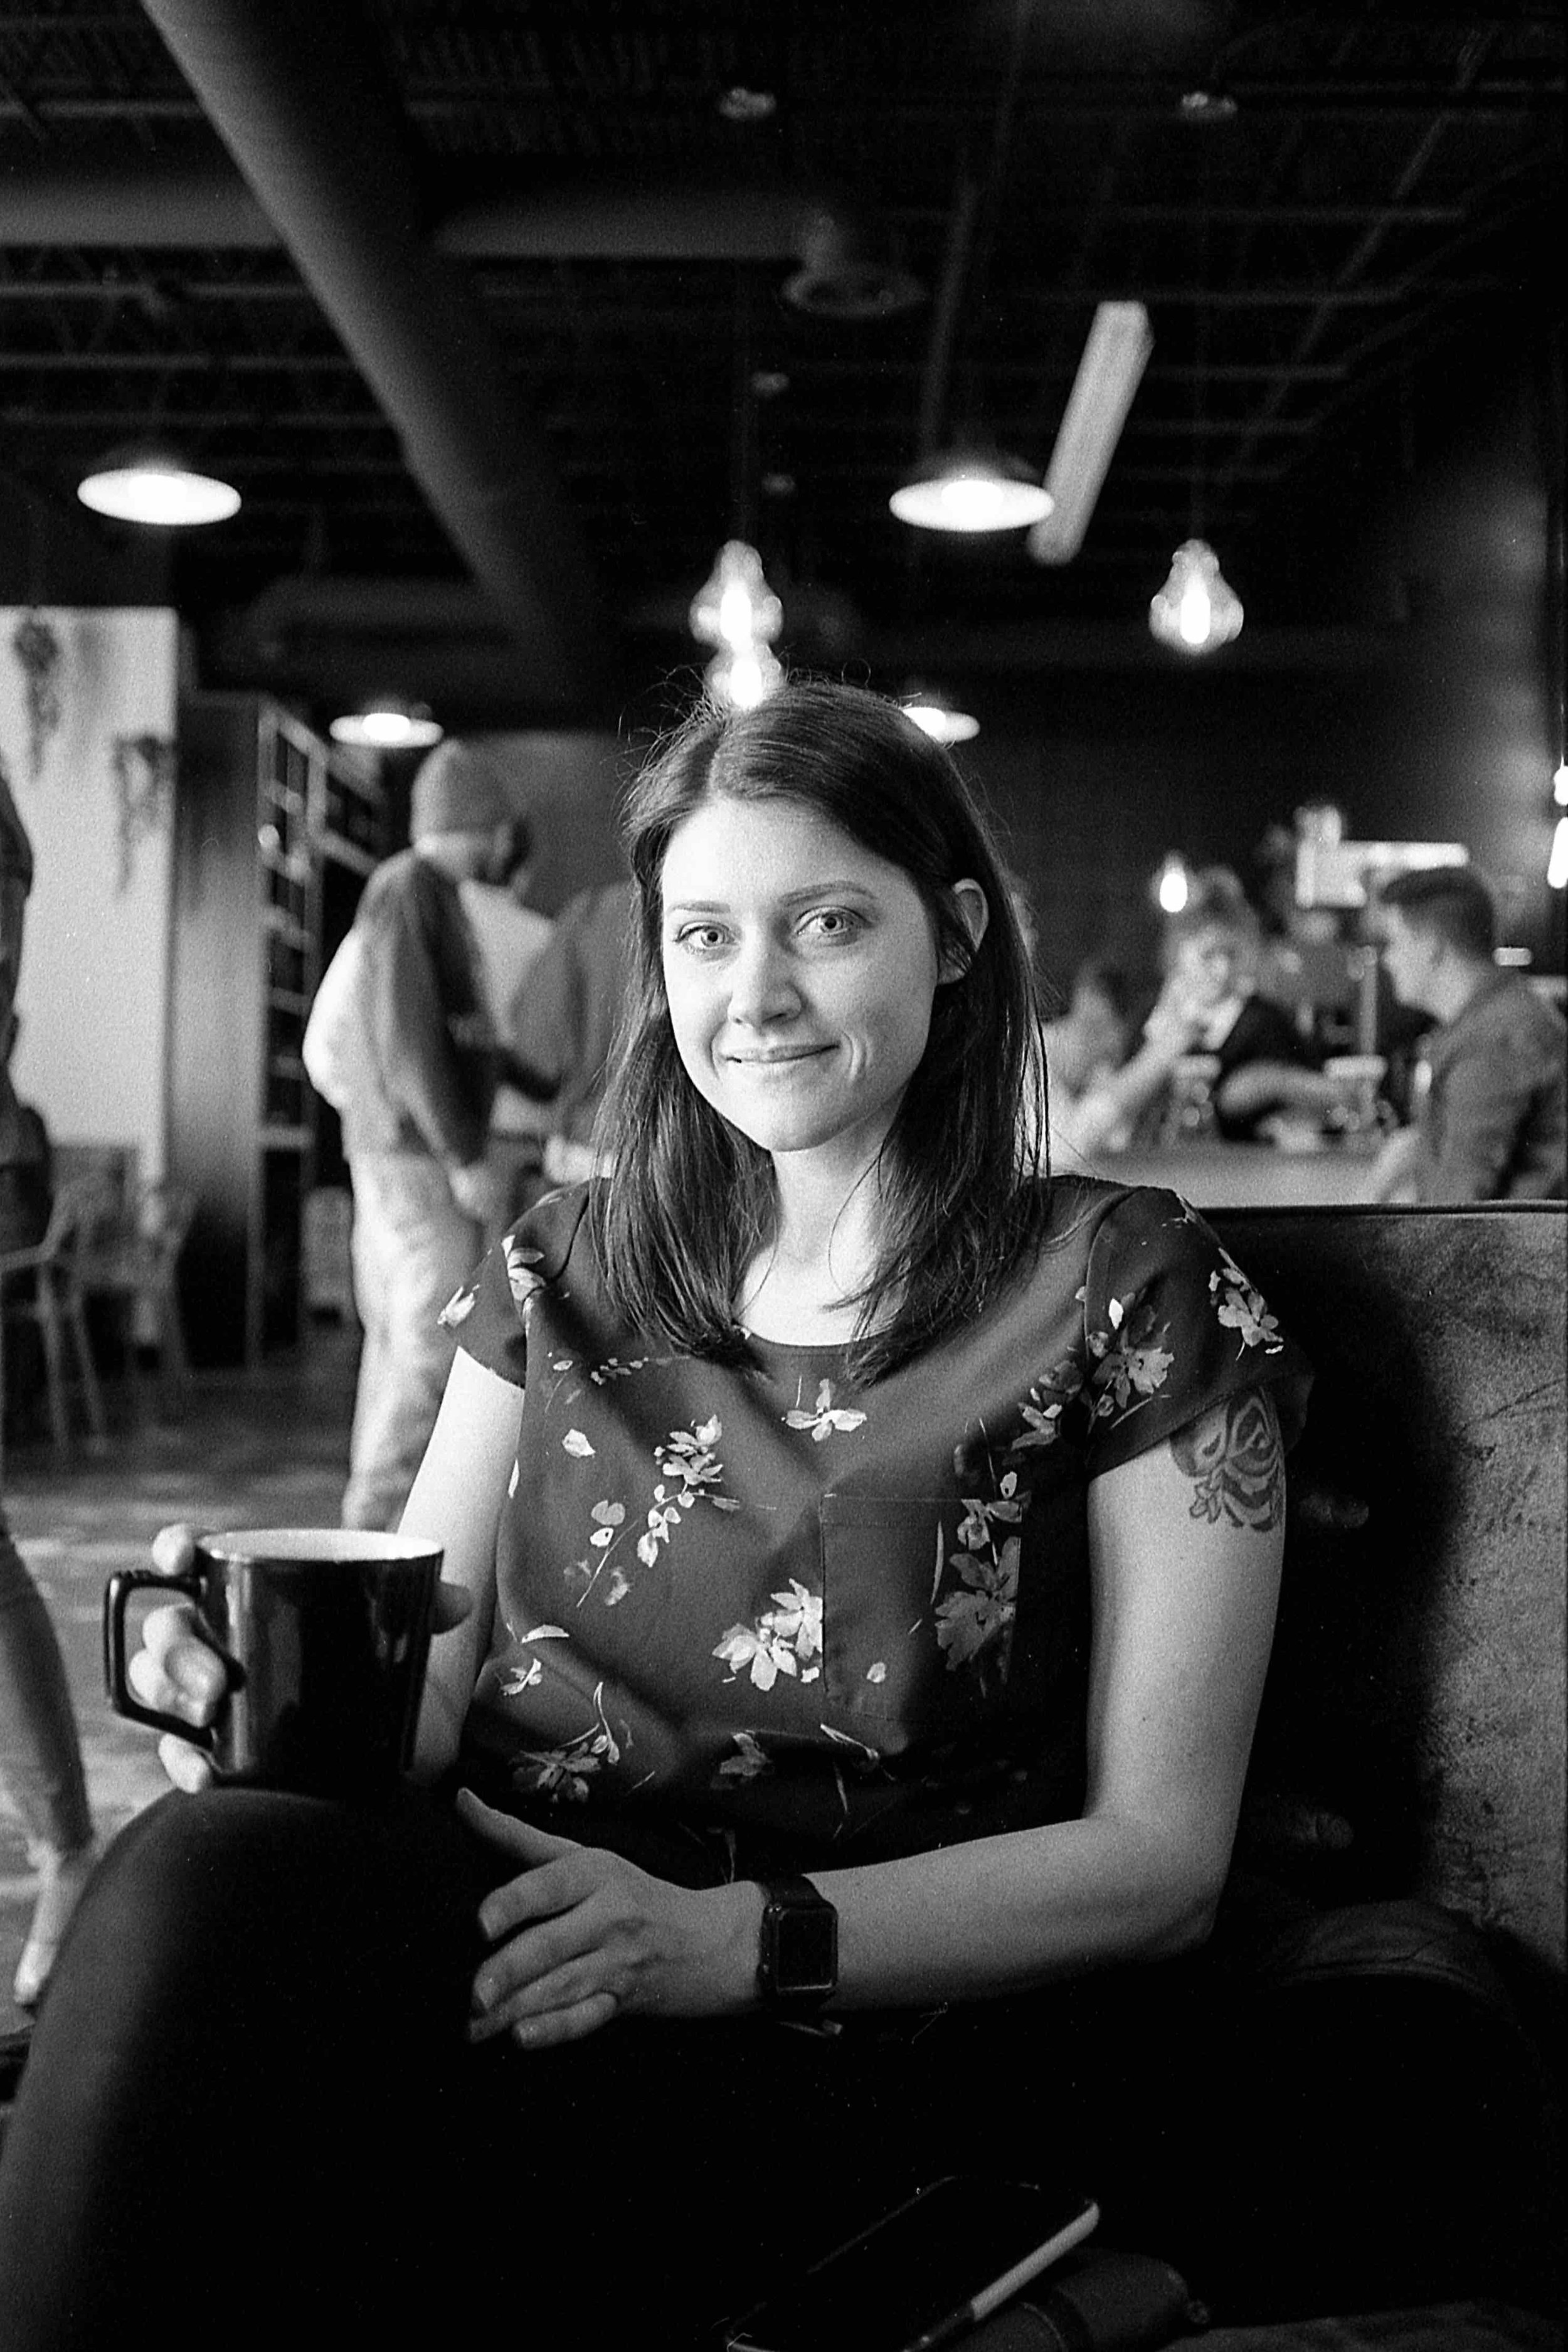 Matt Pittman / Huntsville, AL / Offbeat Coffee Studio / Ilford HP5 / Leica M7 / Street Photography / Portraits